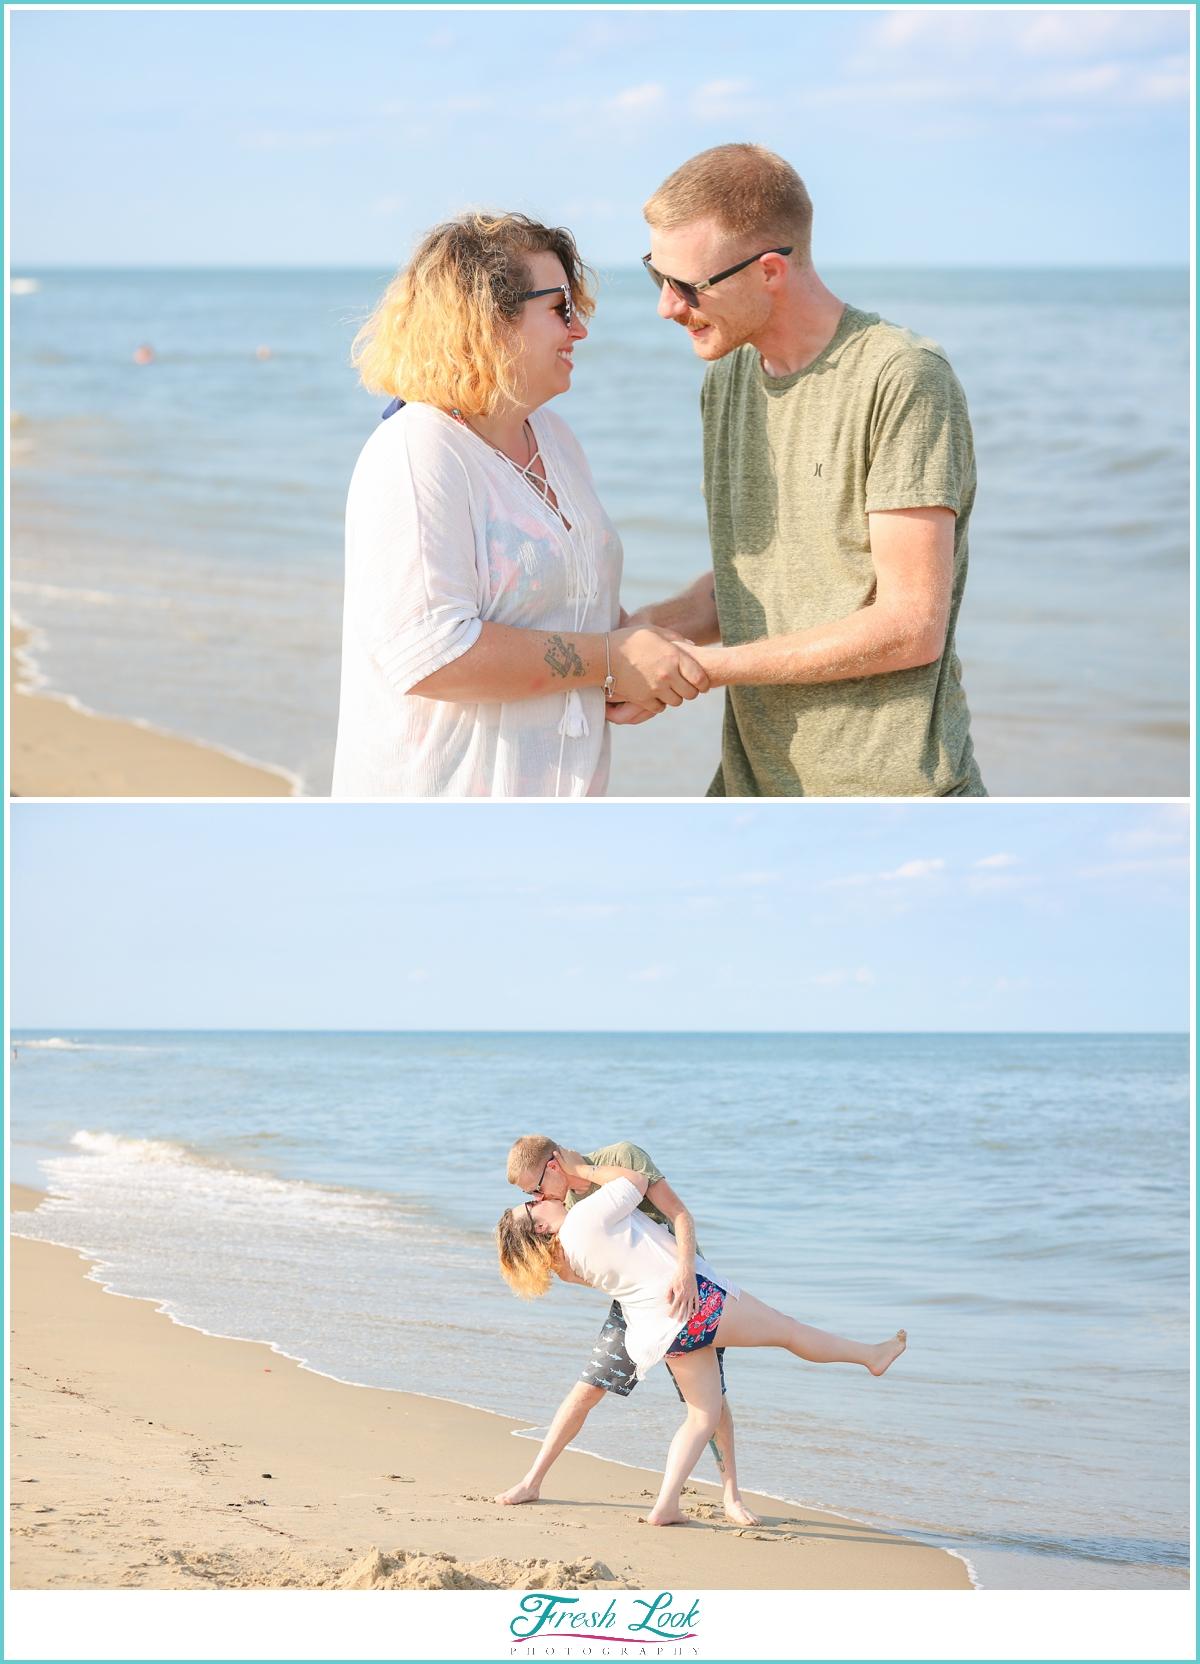 just got engaged photo shoot